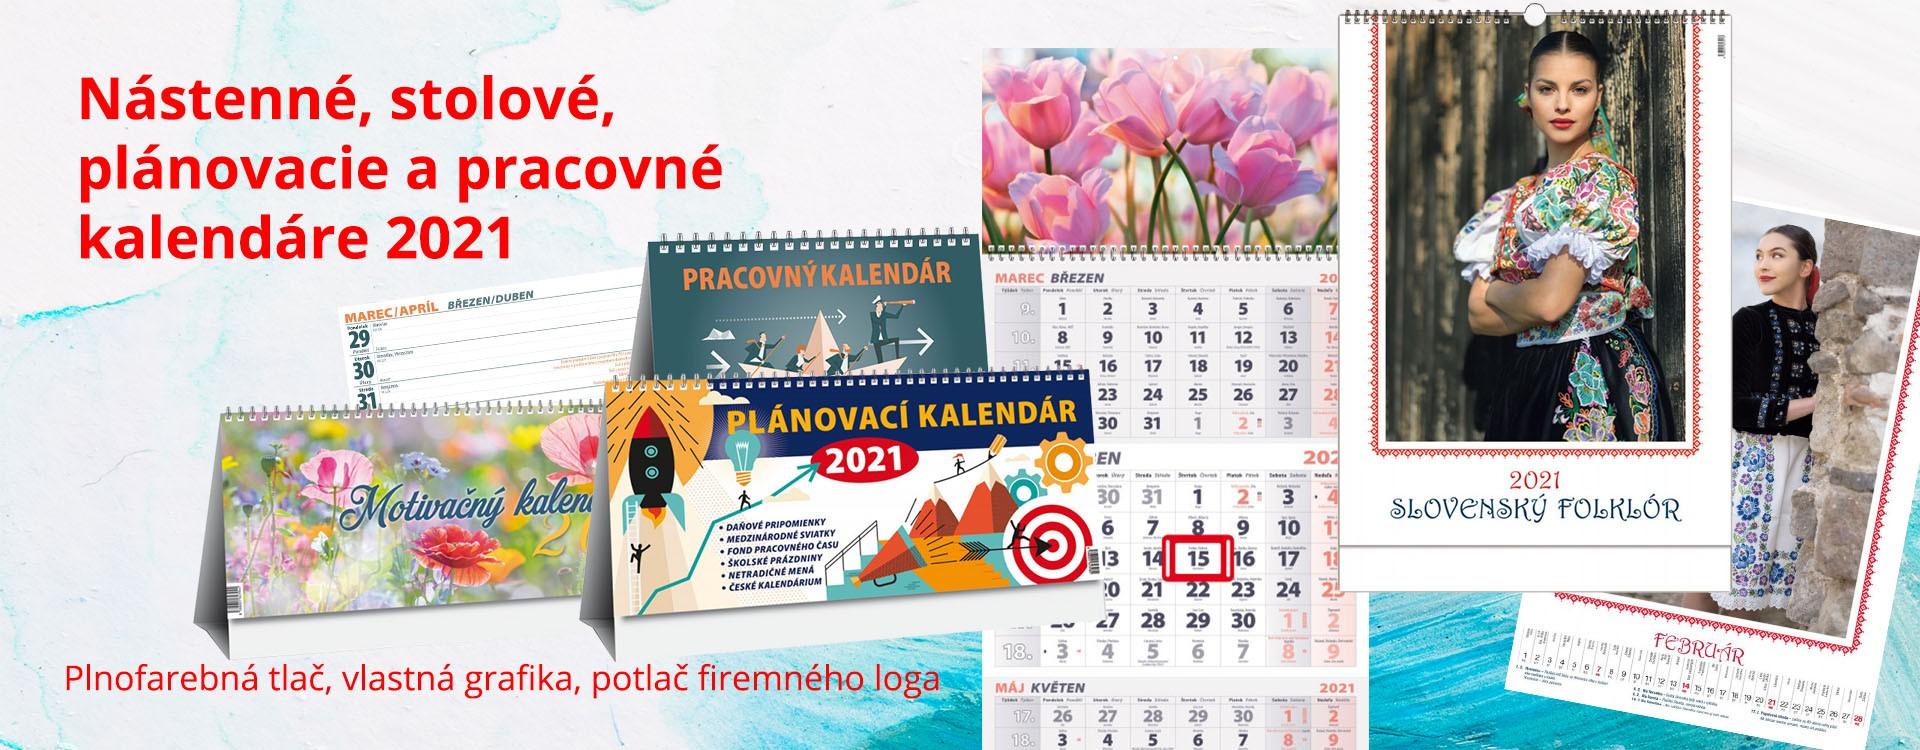 Kalendare 2021